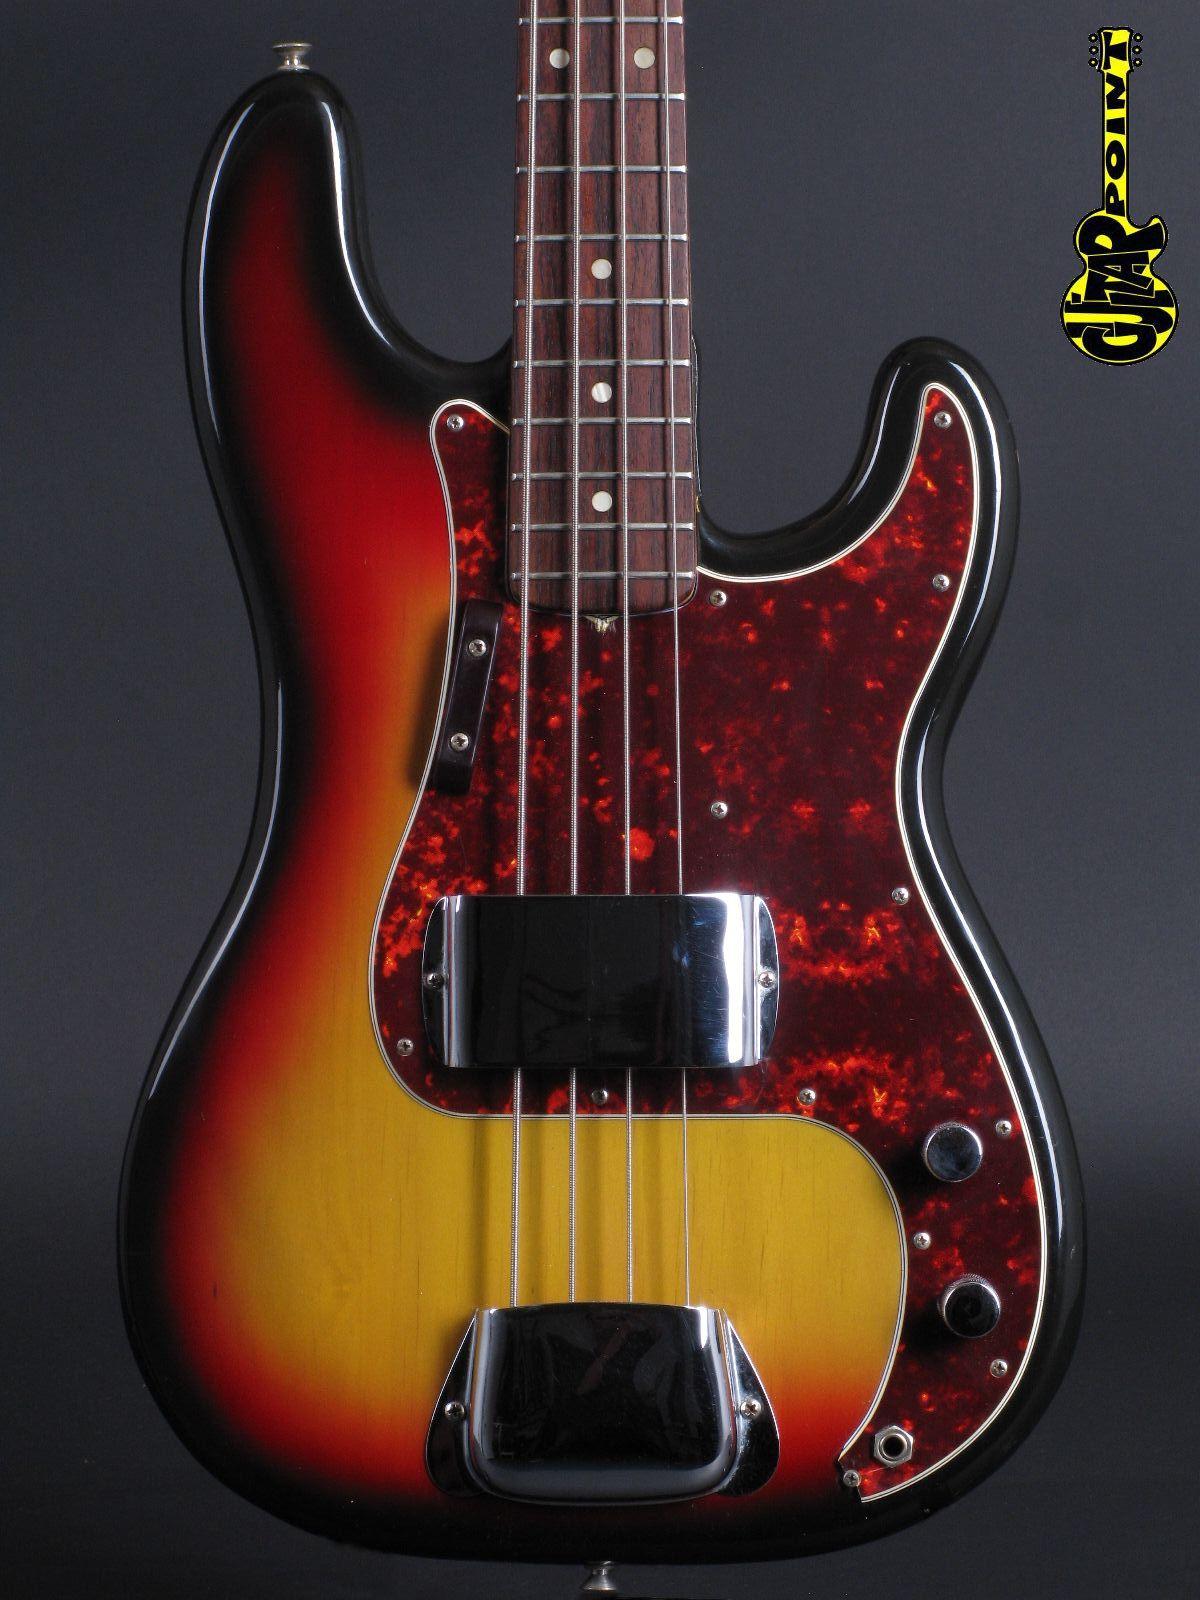 Bass gitarre stimmen online dating